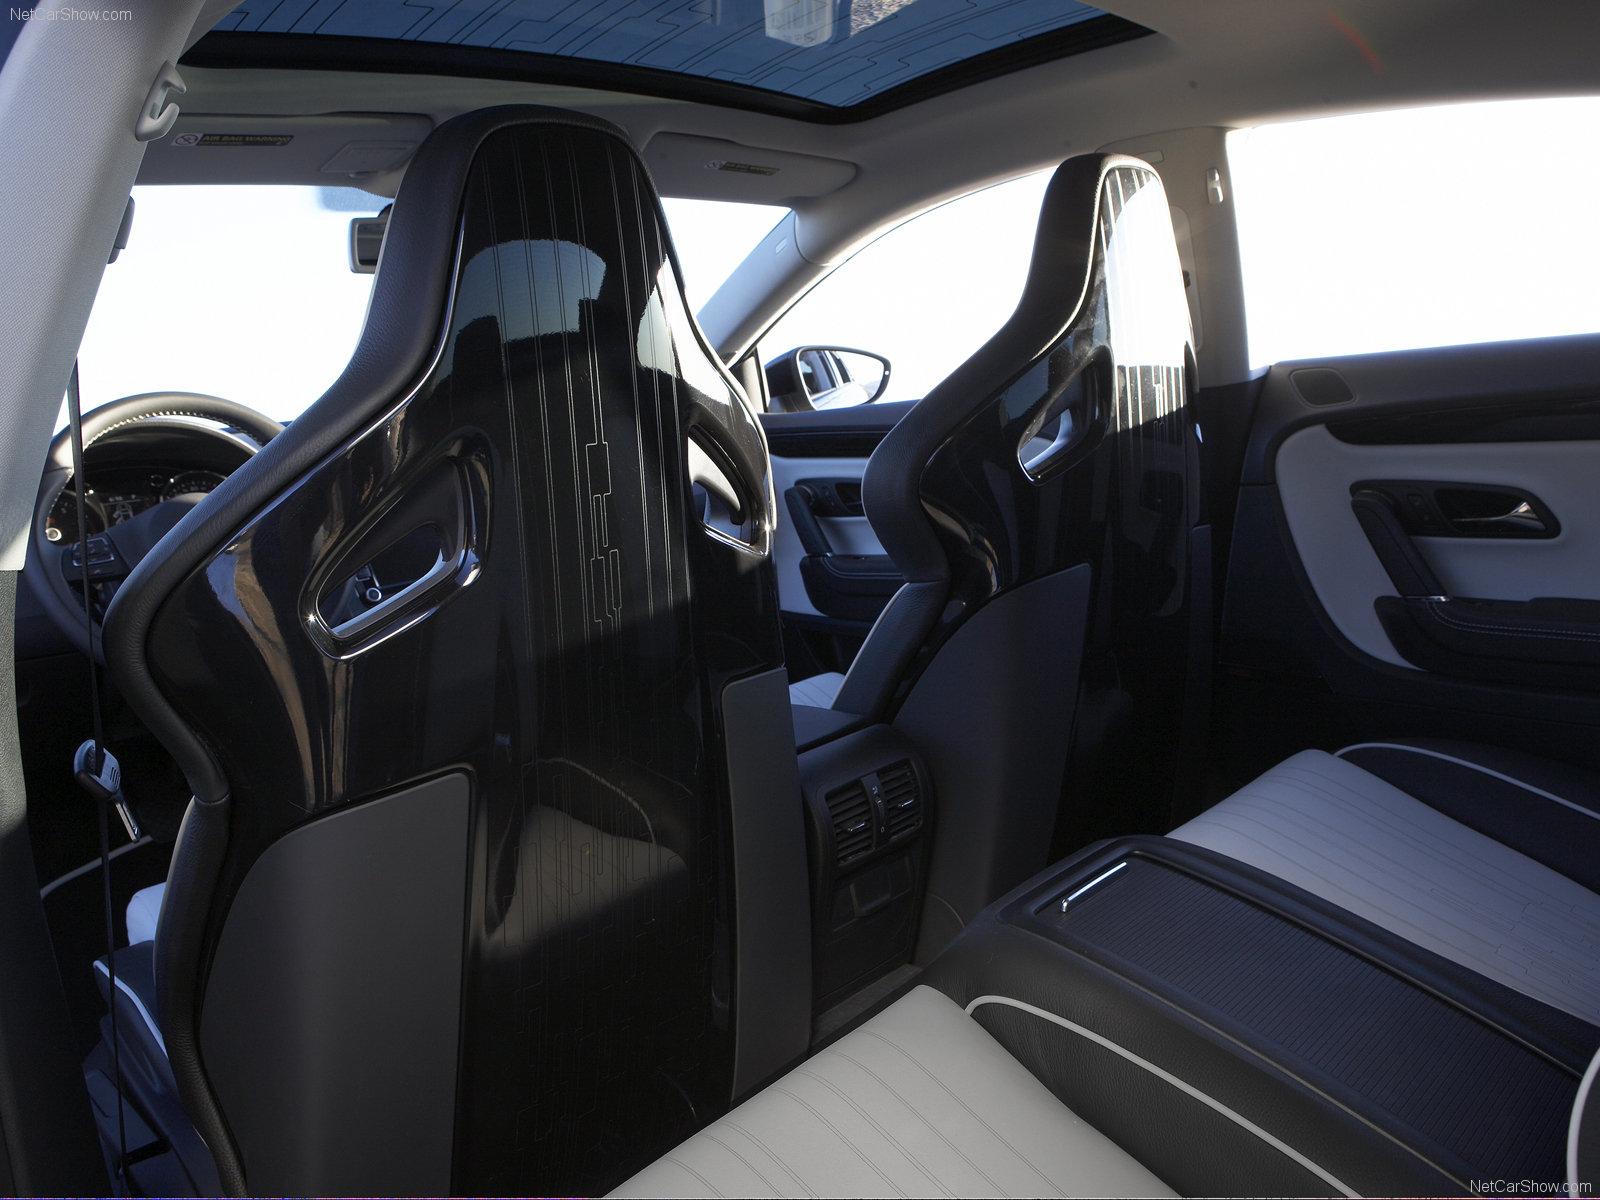 Volkswagen Passat CC Performance Concept photos - PhotoGallery with 5 pics| CarsBase.com